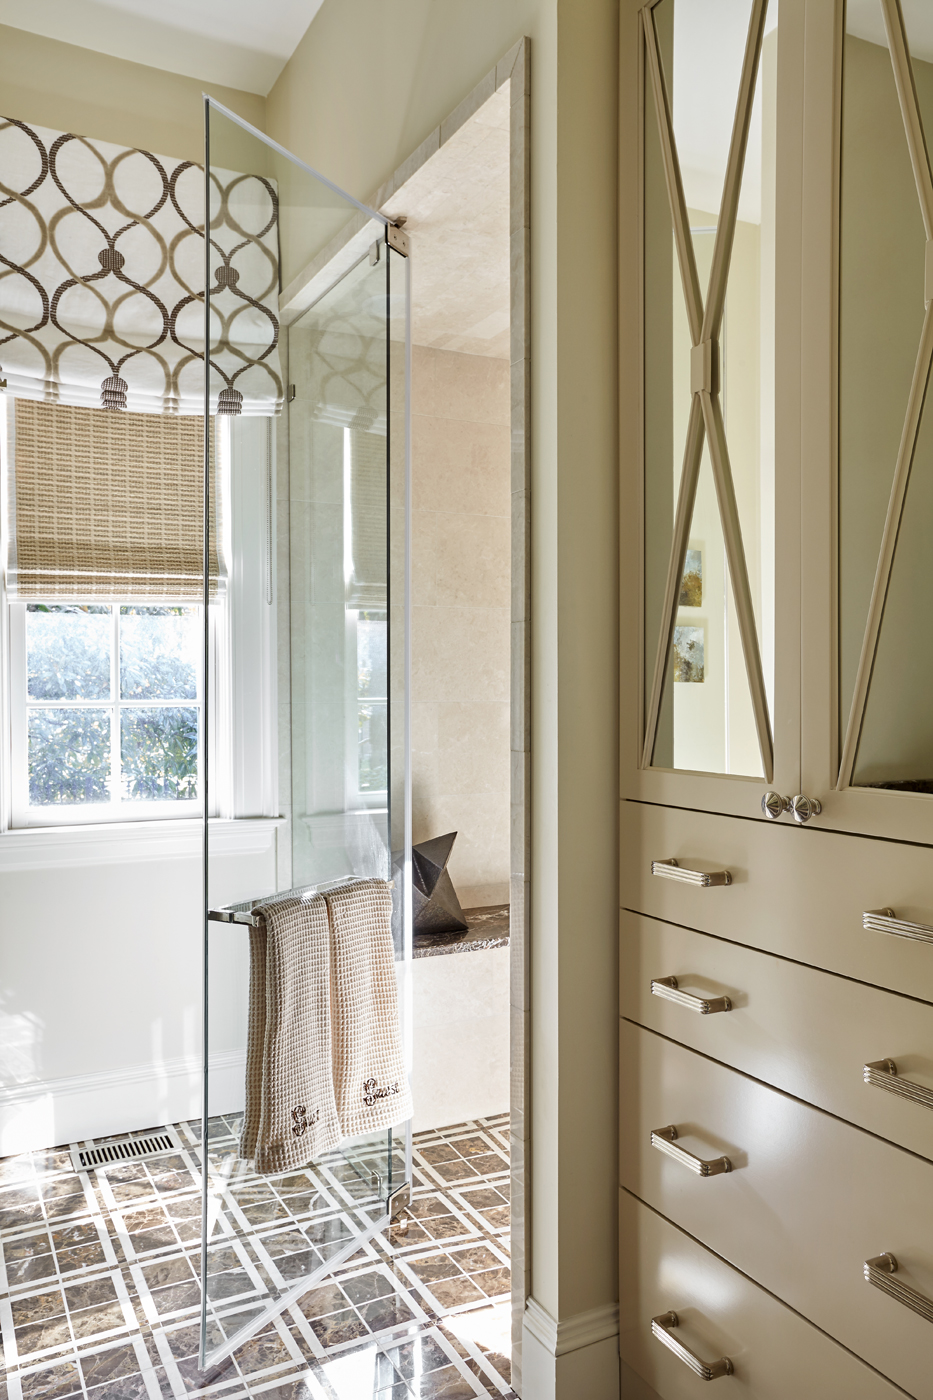 Bathroom cabinetry with mirrored doors; shower enclosure with Emperador Dark and Crema Marfil marble | Savage Interior Design